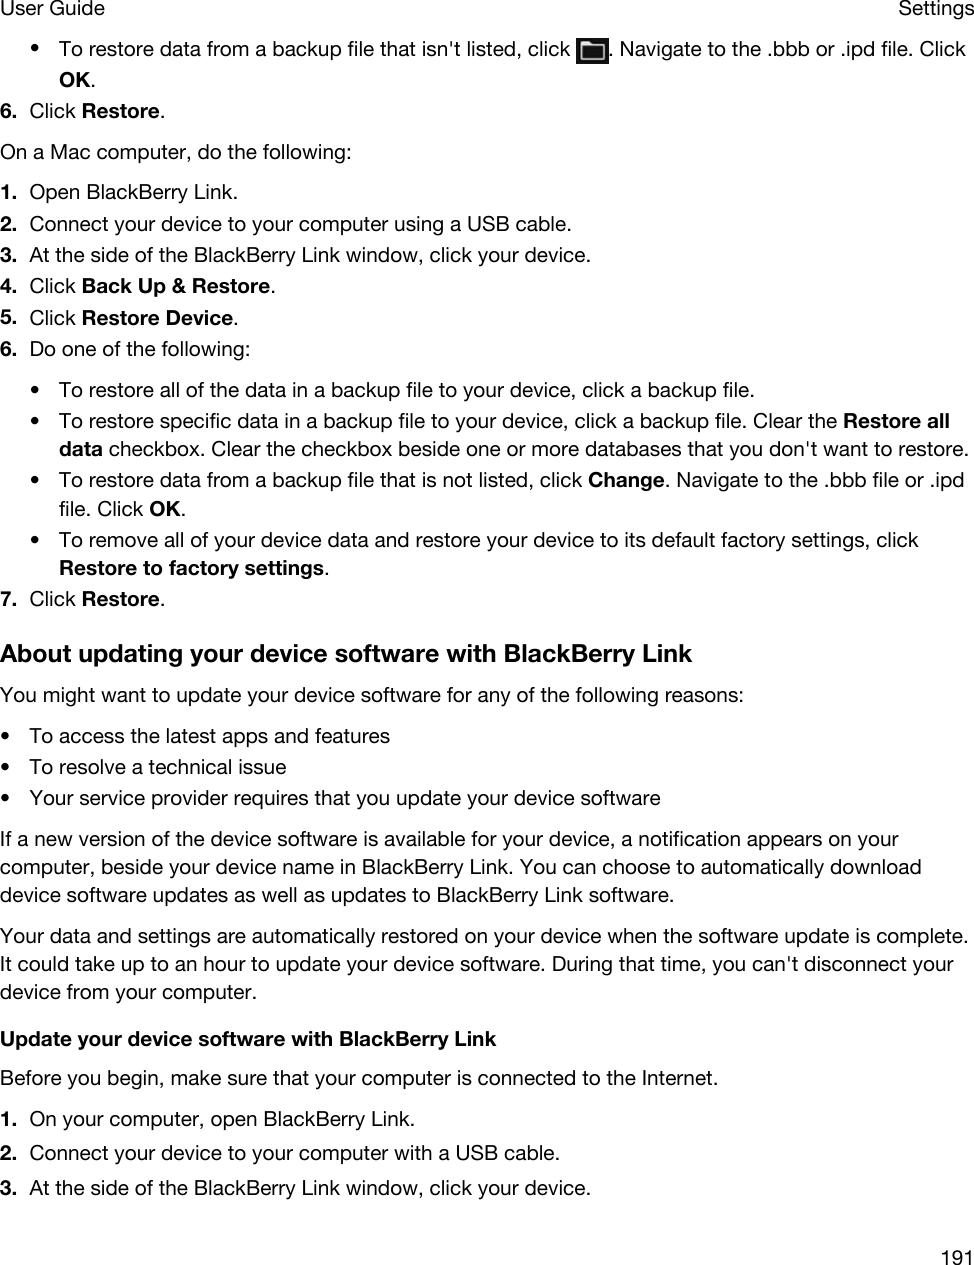 Blackberry Porsche Design P9983 V10 3 1 User Guide P'9983 Smartphone